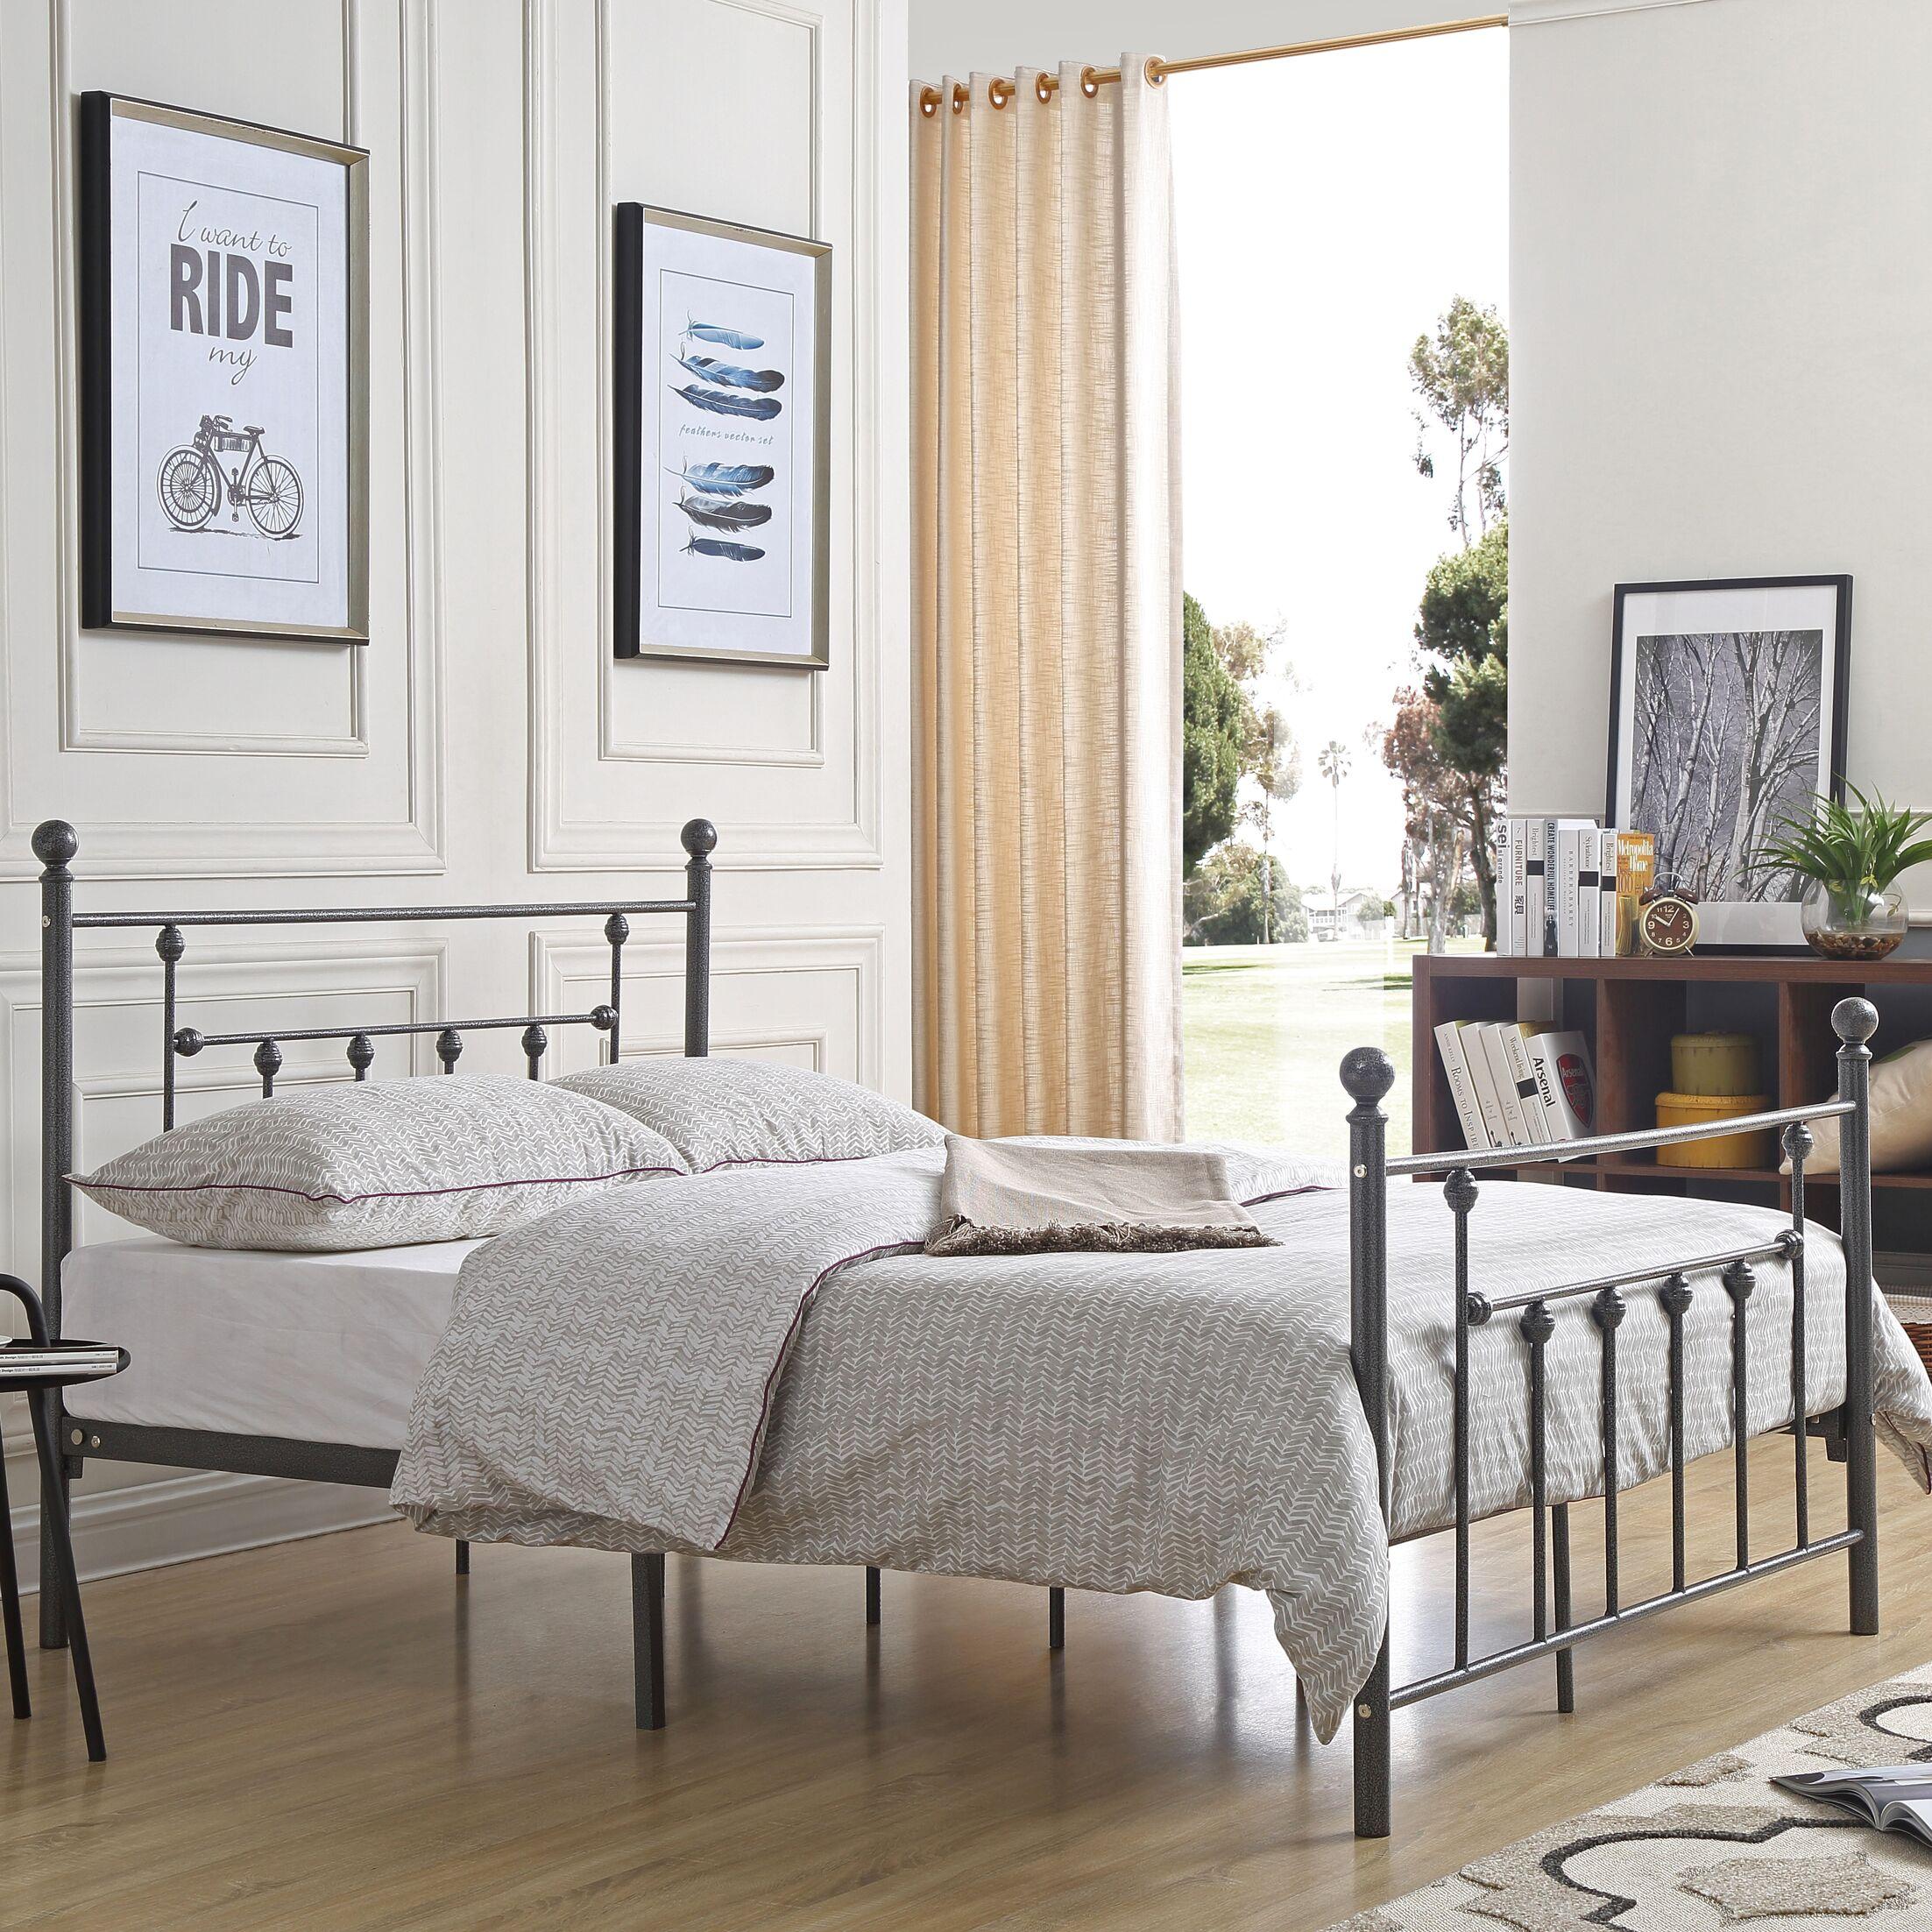 Besaw Platform Bed Size: Full, Color: Charcoal